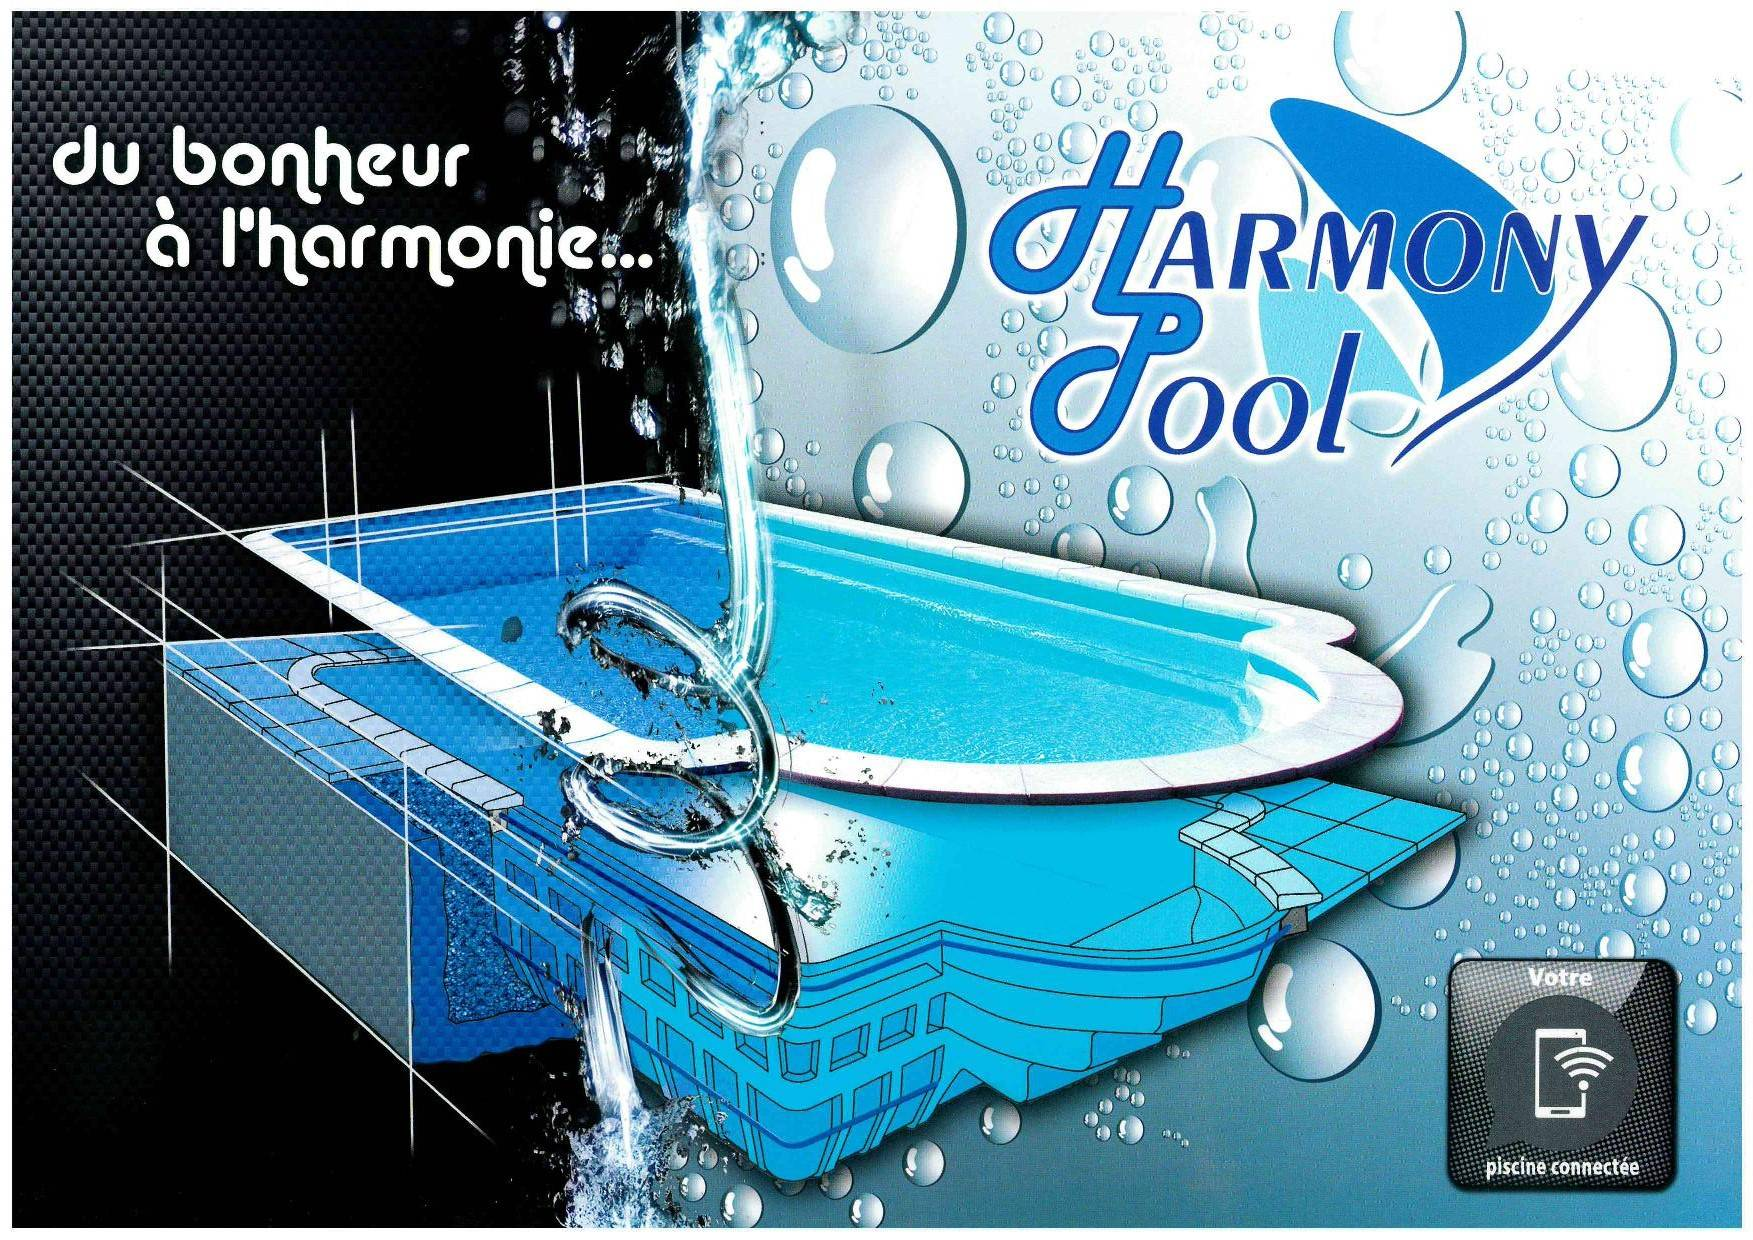 Harmony pool la piscine connectée Ferré Piscines